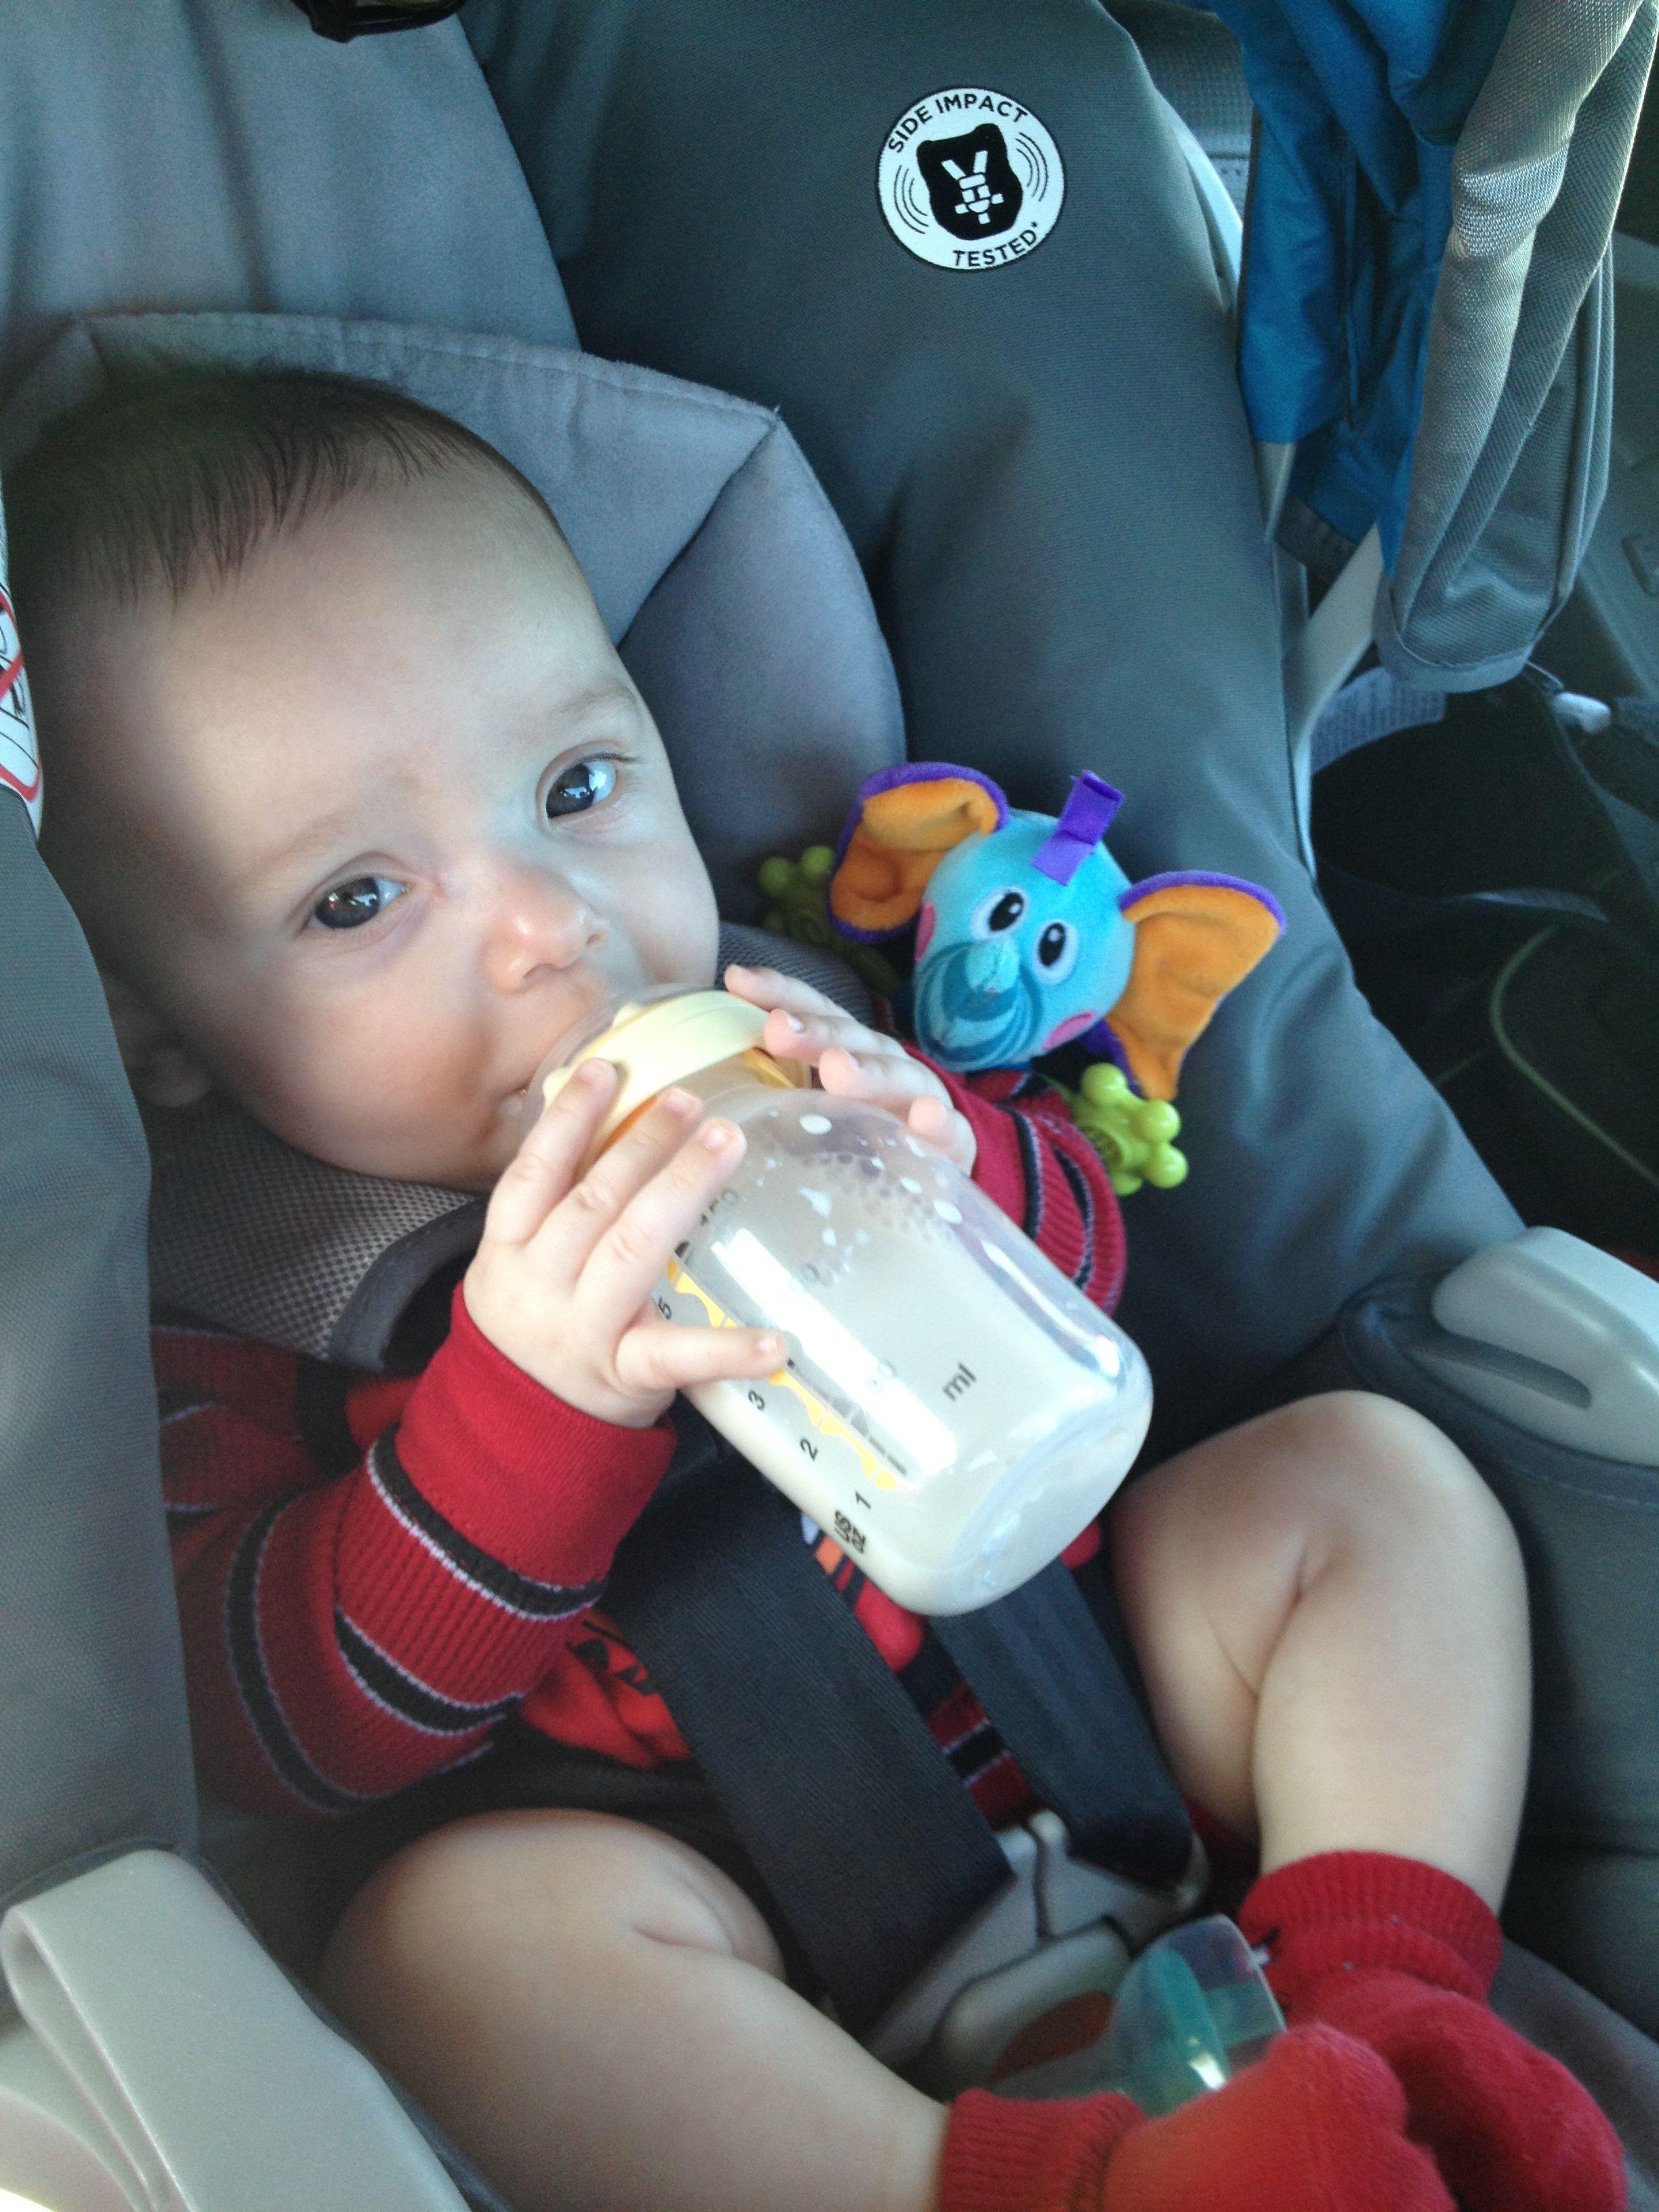 Liam holding his own bottle   Bottle, Baby, Children